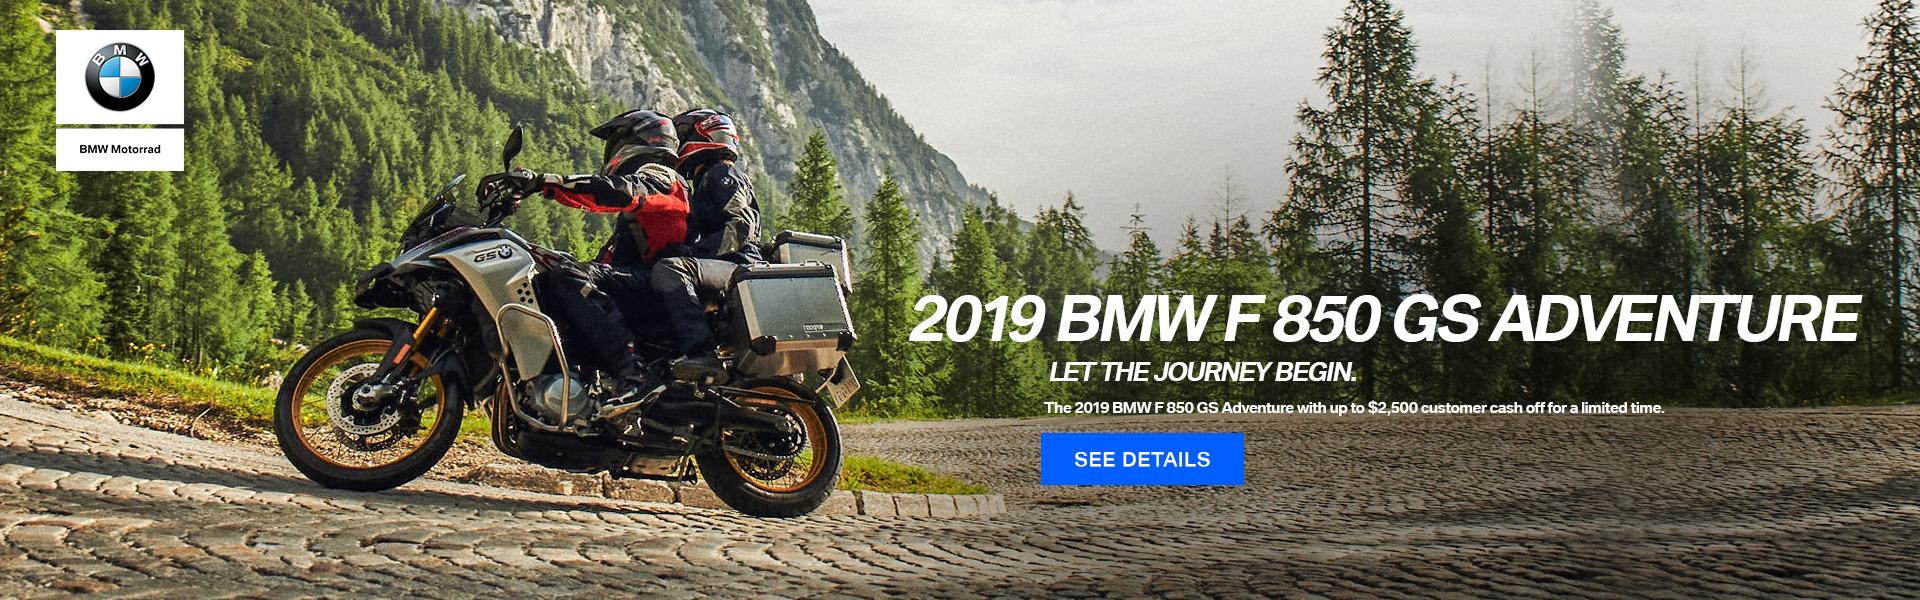 2019 BMW F 850 GS Adventure